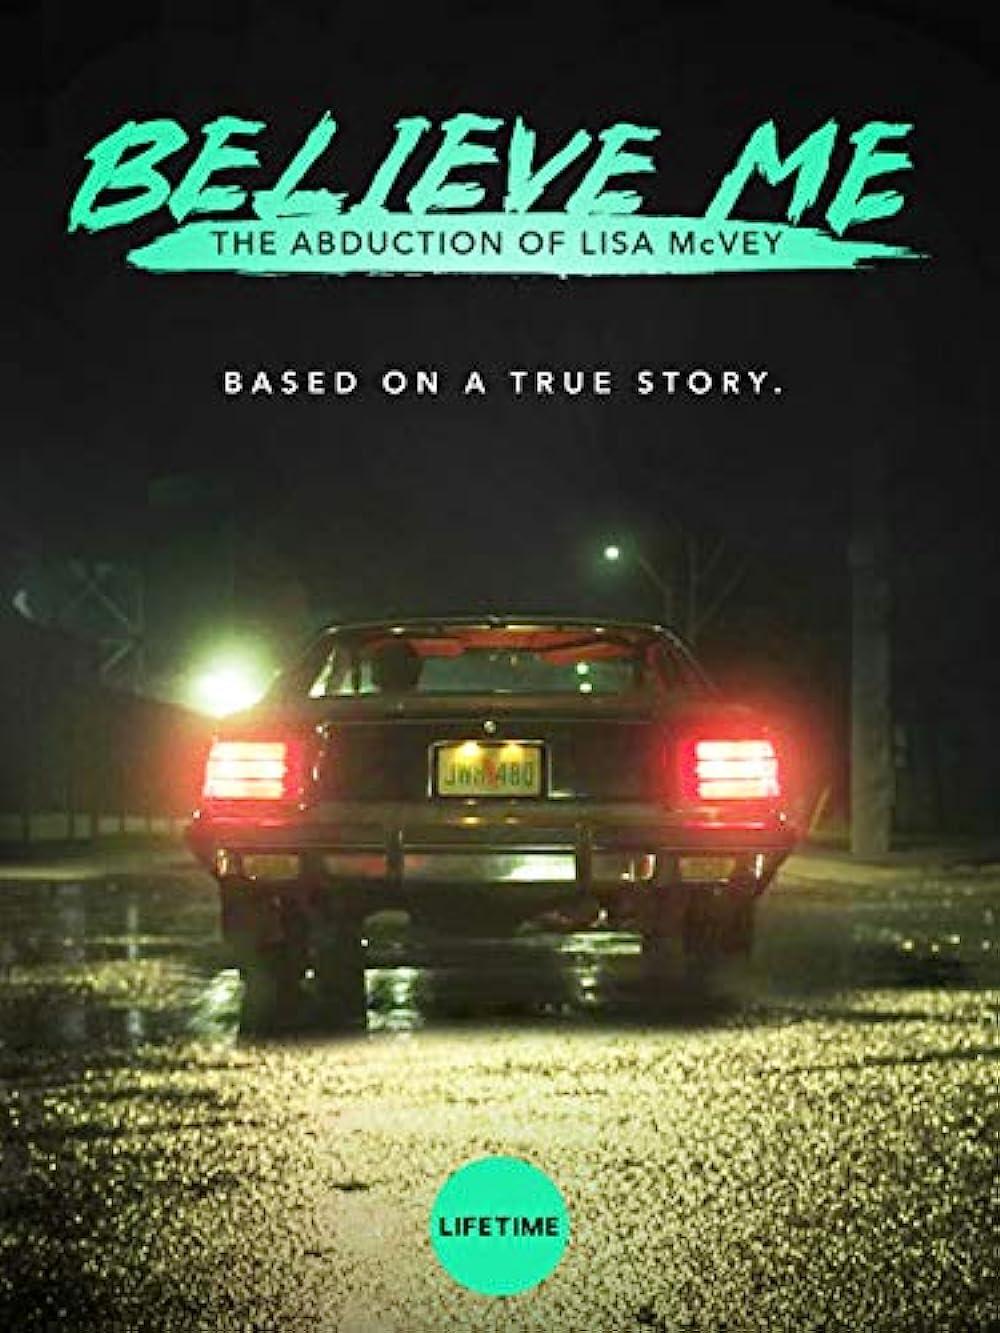 Believe Me The Abduction Of Lisa Mcvey Tv Movie 2018 Imdb